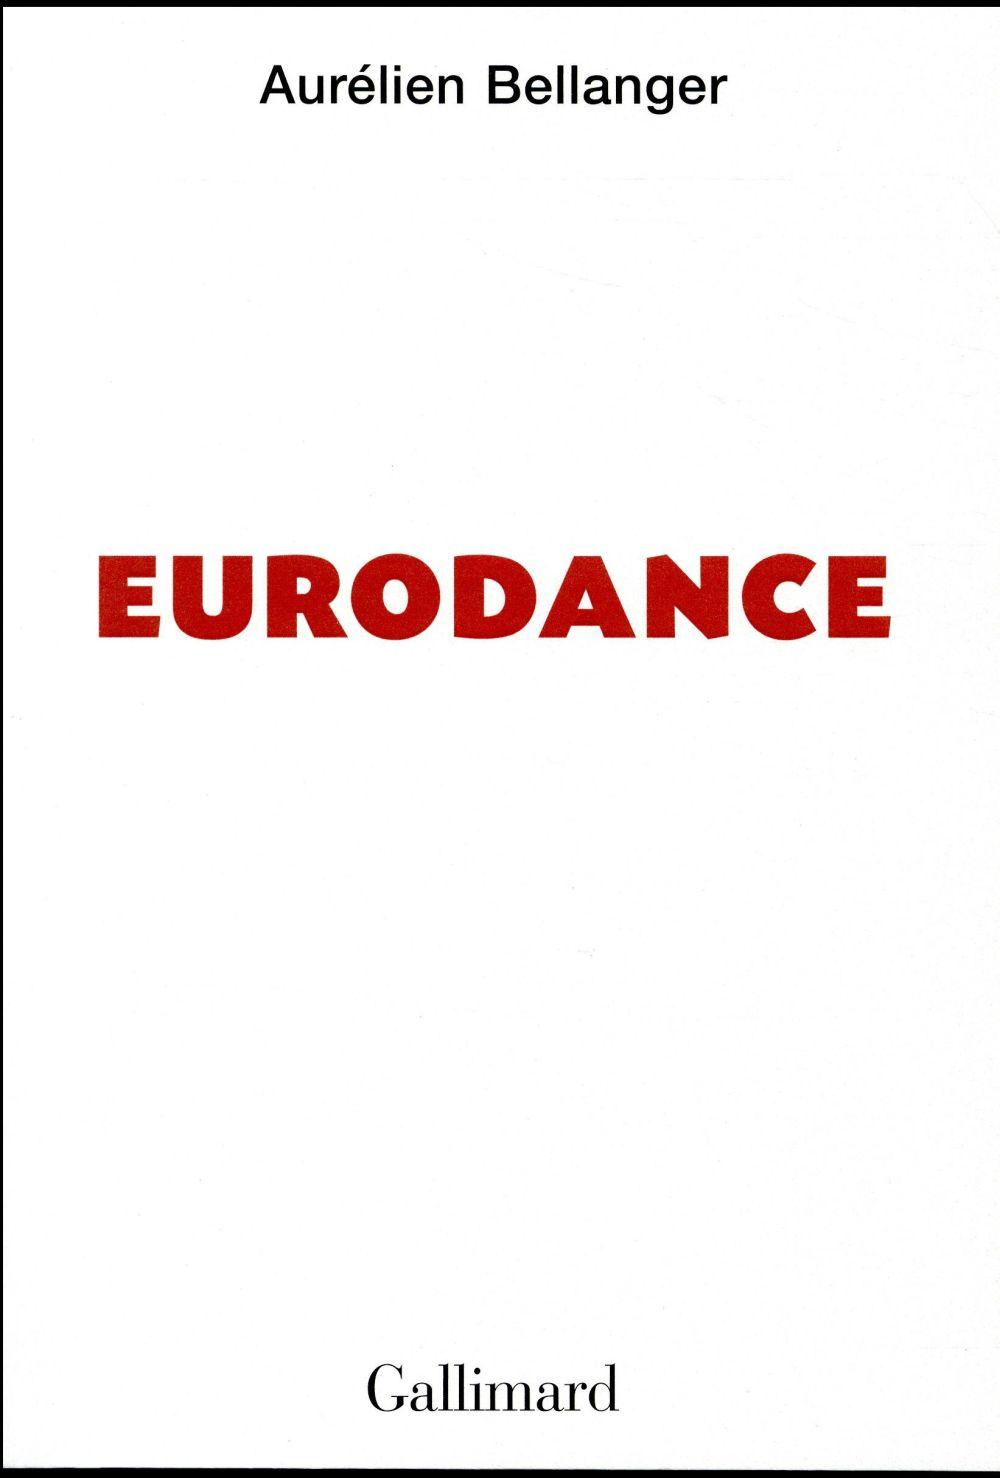 EURODANCE BELLANGER AURELIEN GALLIMARD